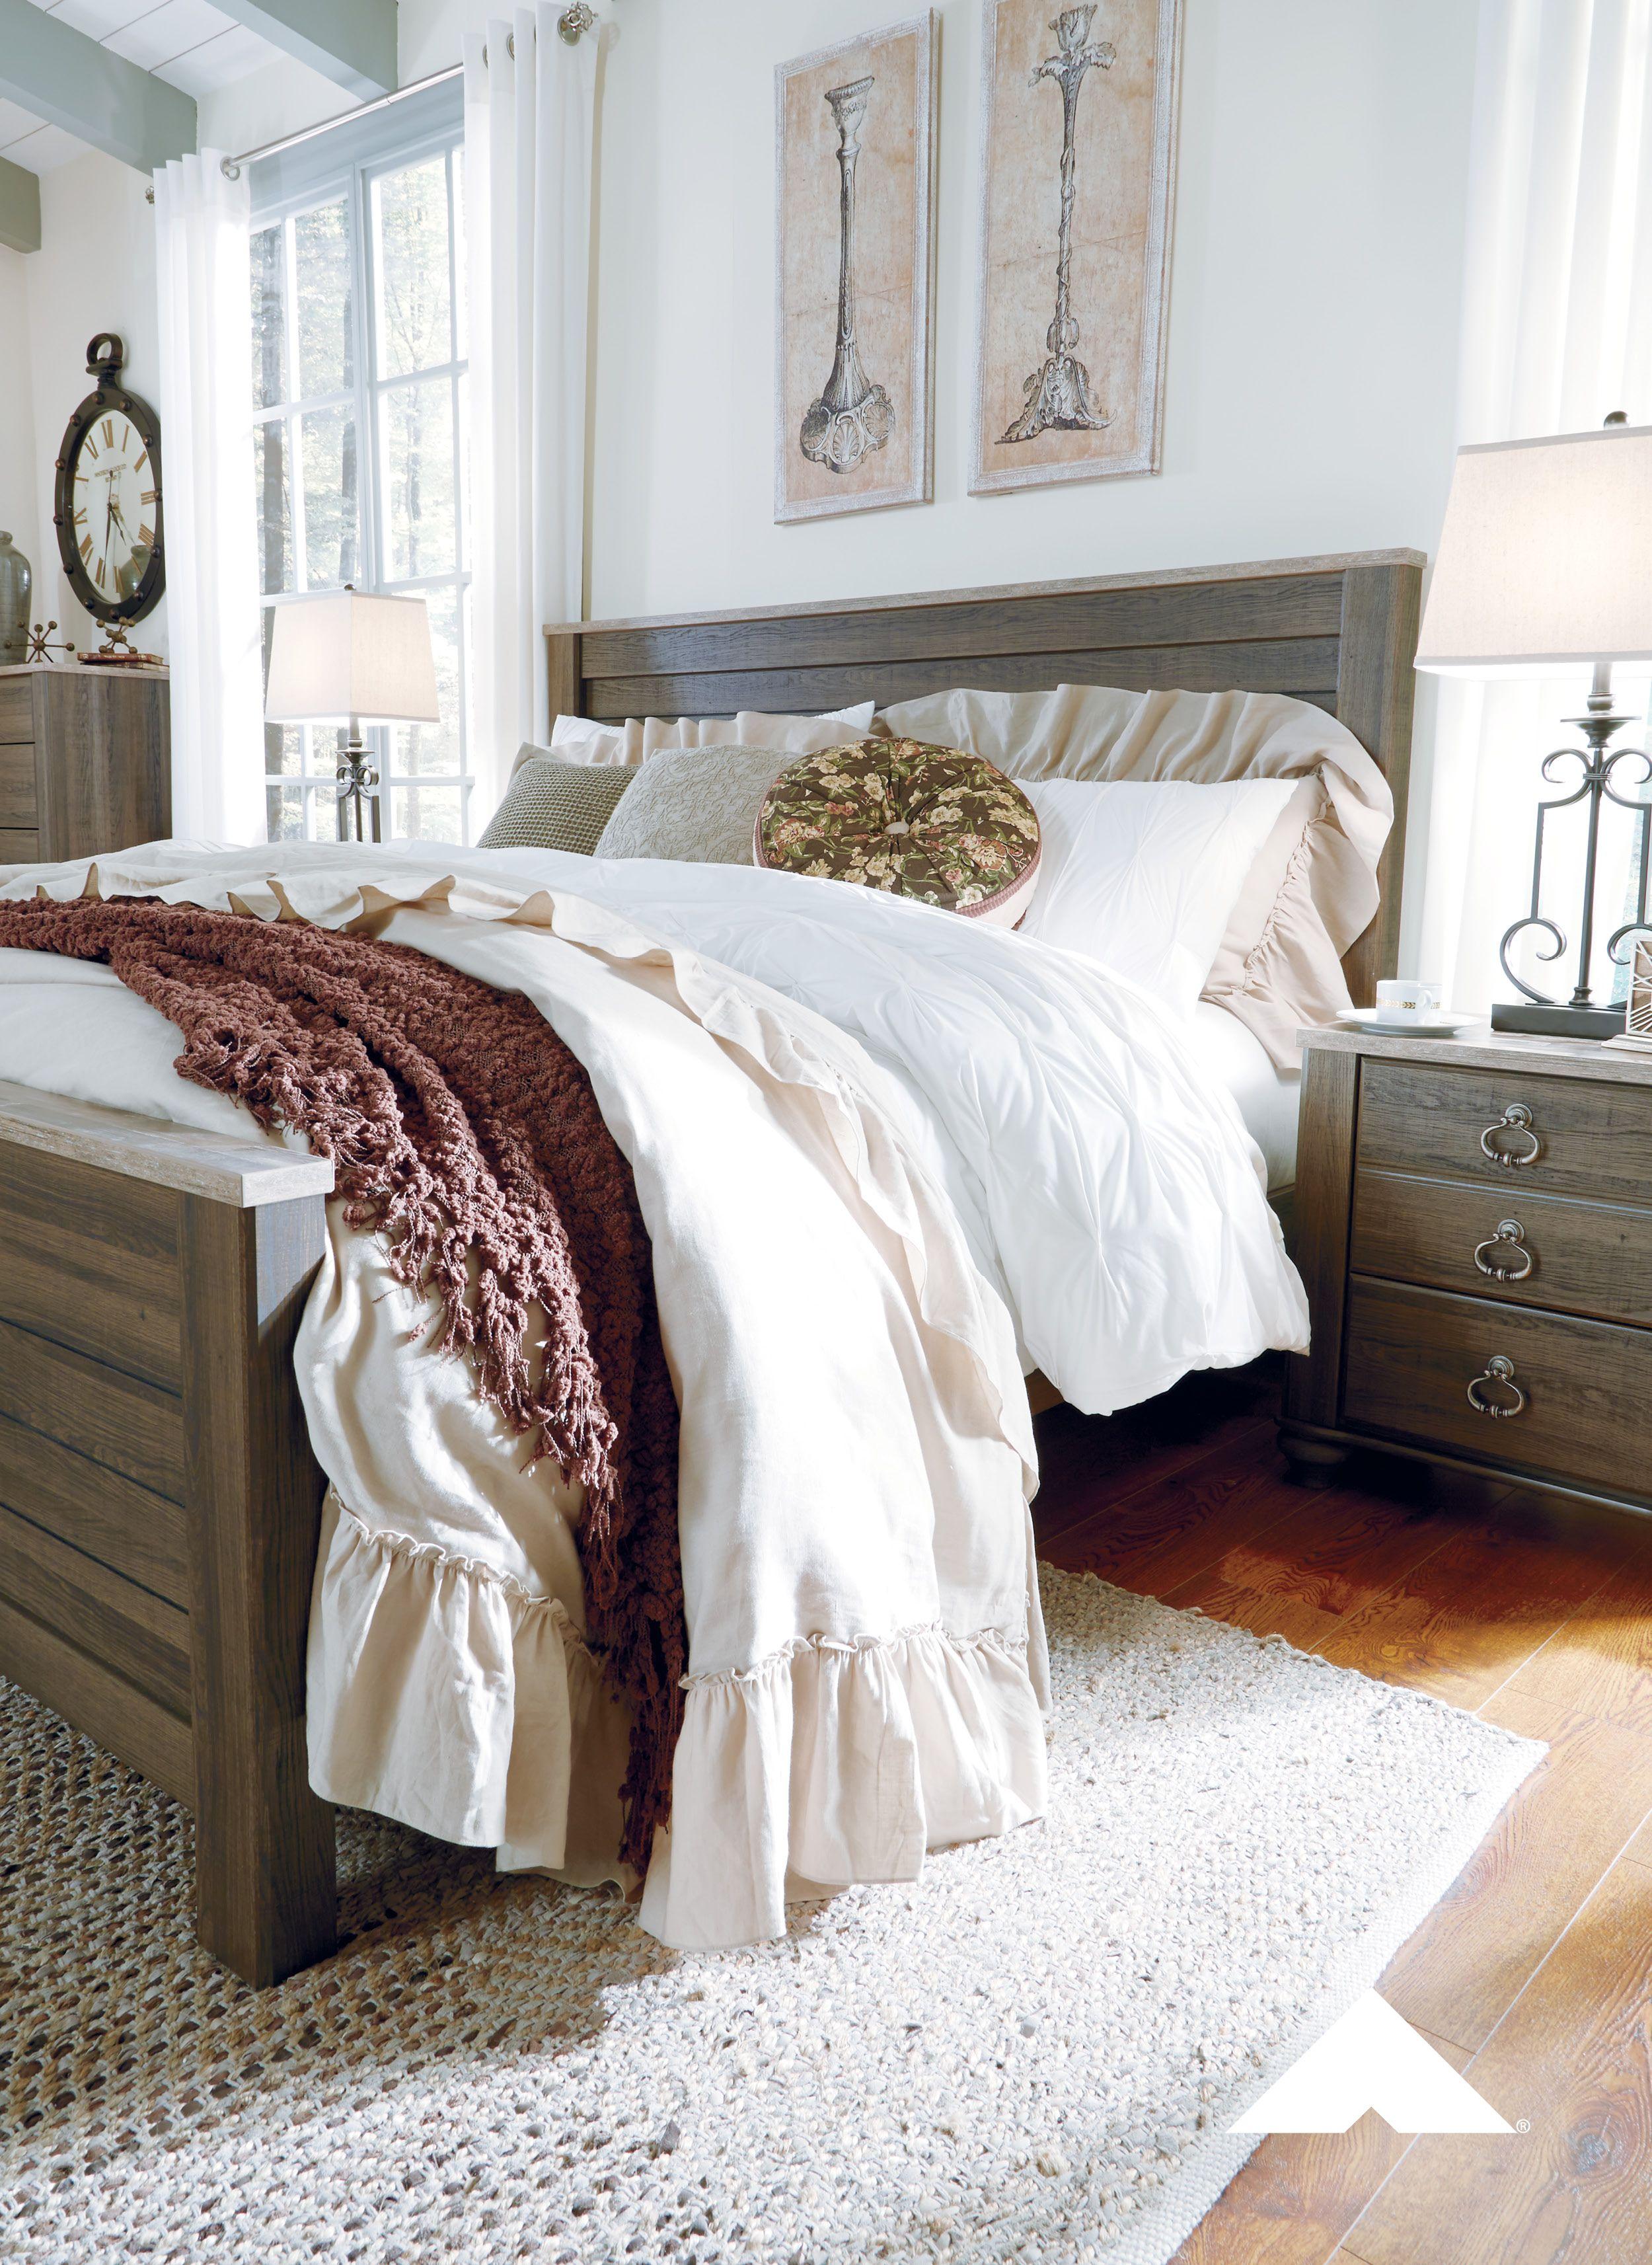 birmington queen panel headboard from ashley furniture